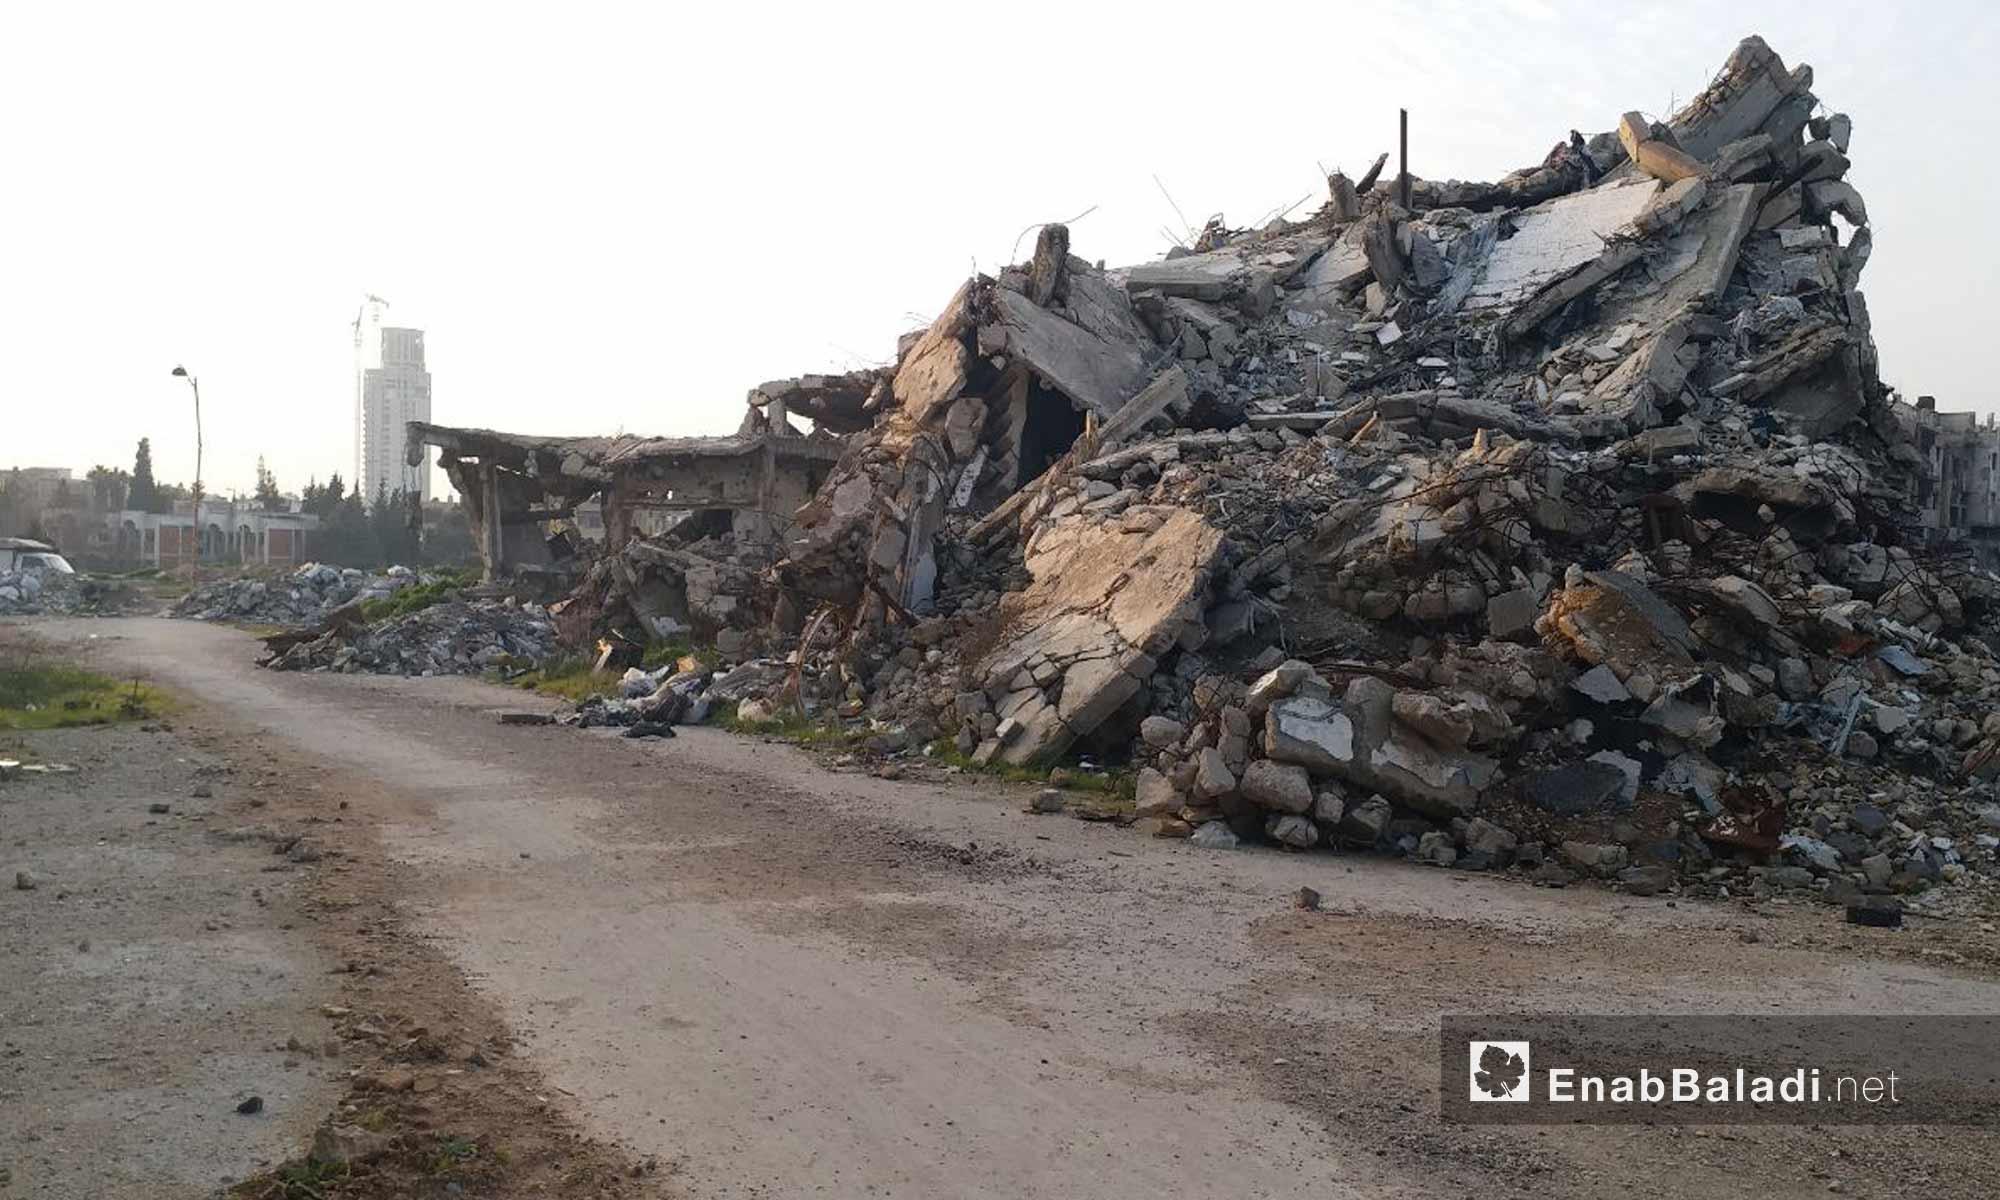 Destroyed buildings in the Bab al-Dreib neighborhood in the city of Homs - January 24, 2019 (Enab Baladi)